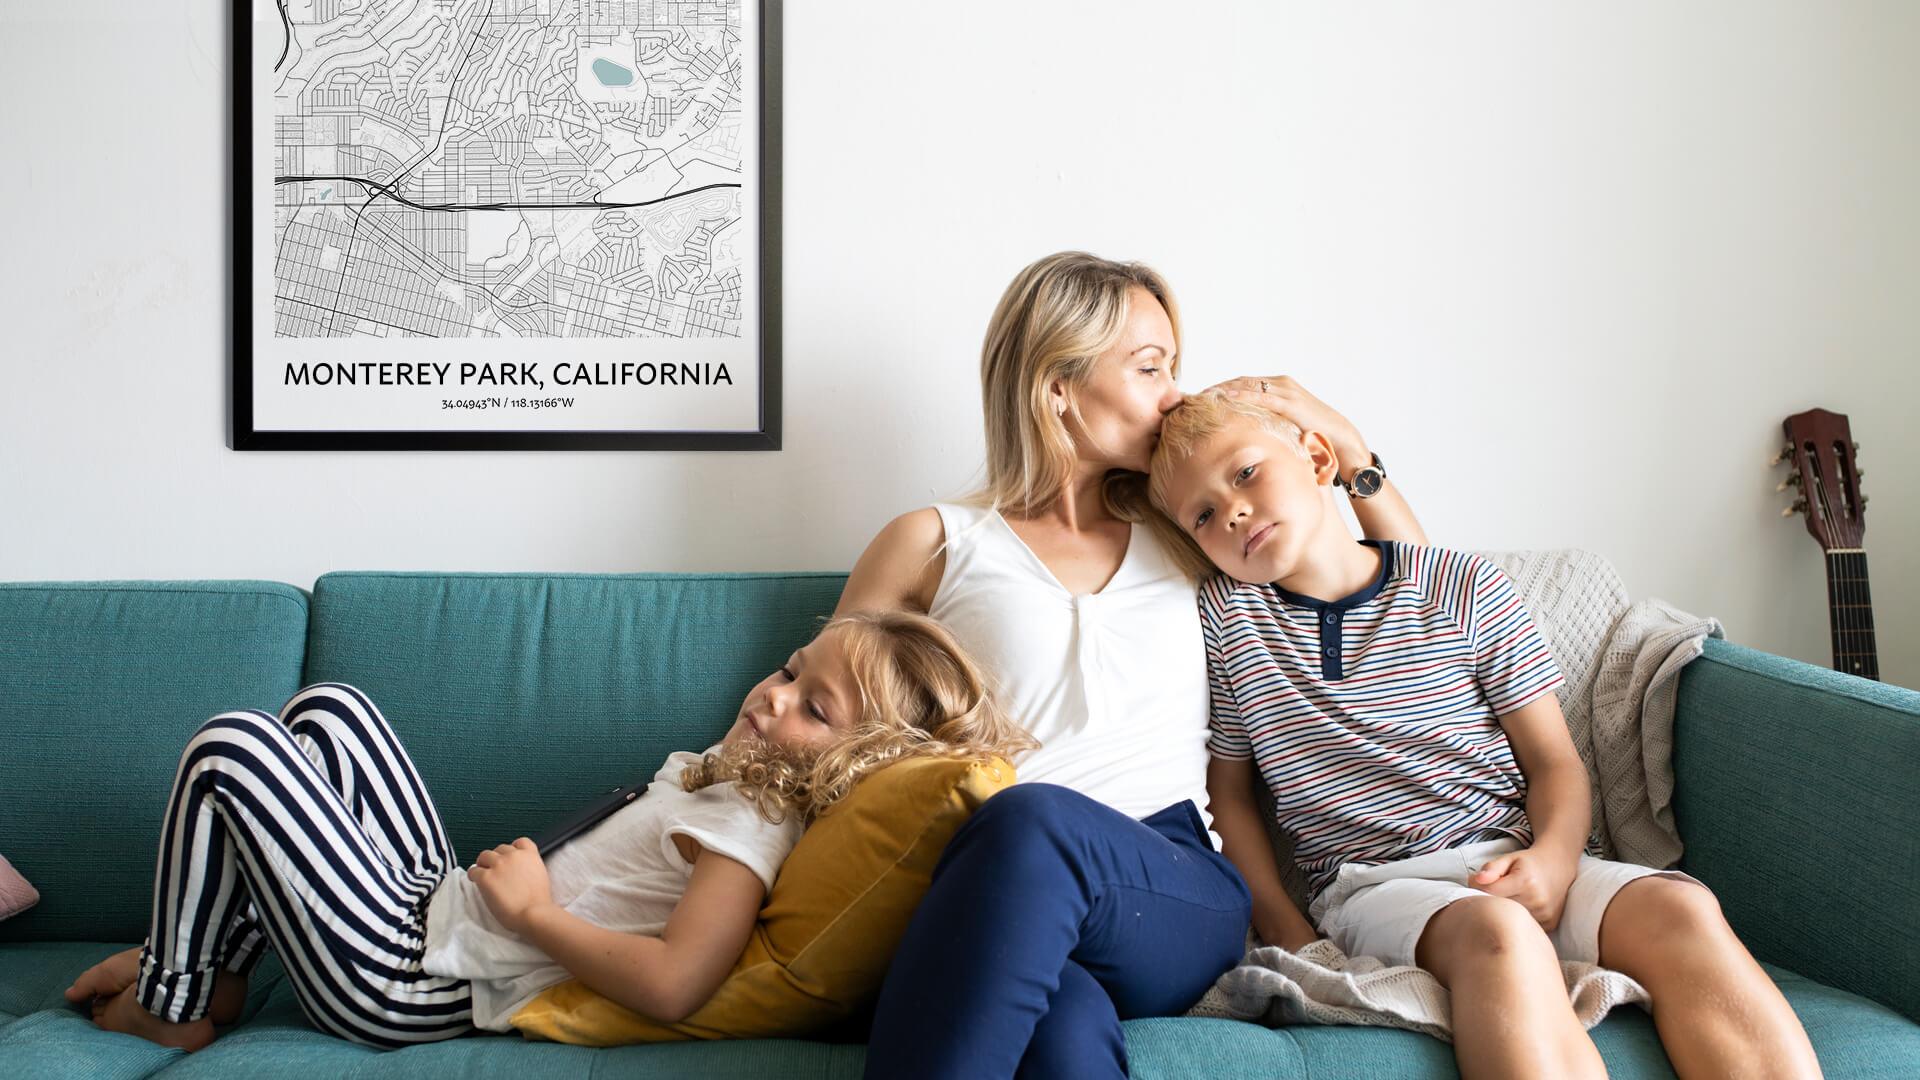 Monterey Park map poster